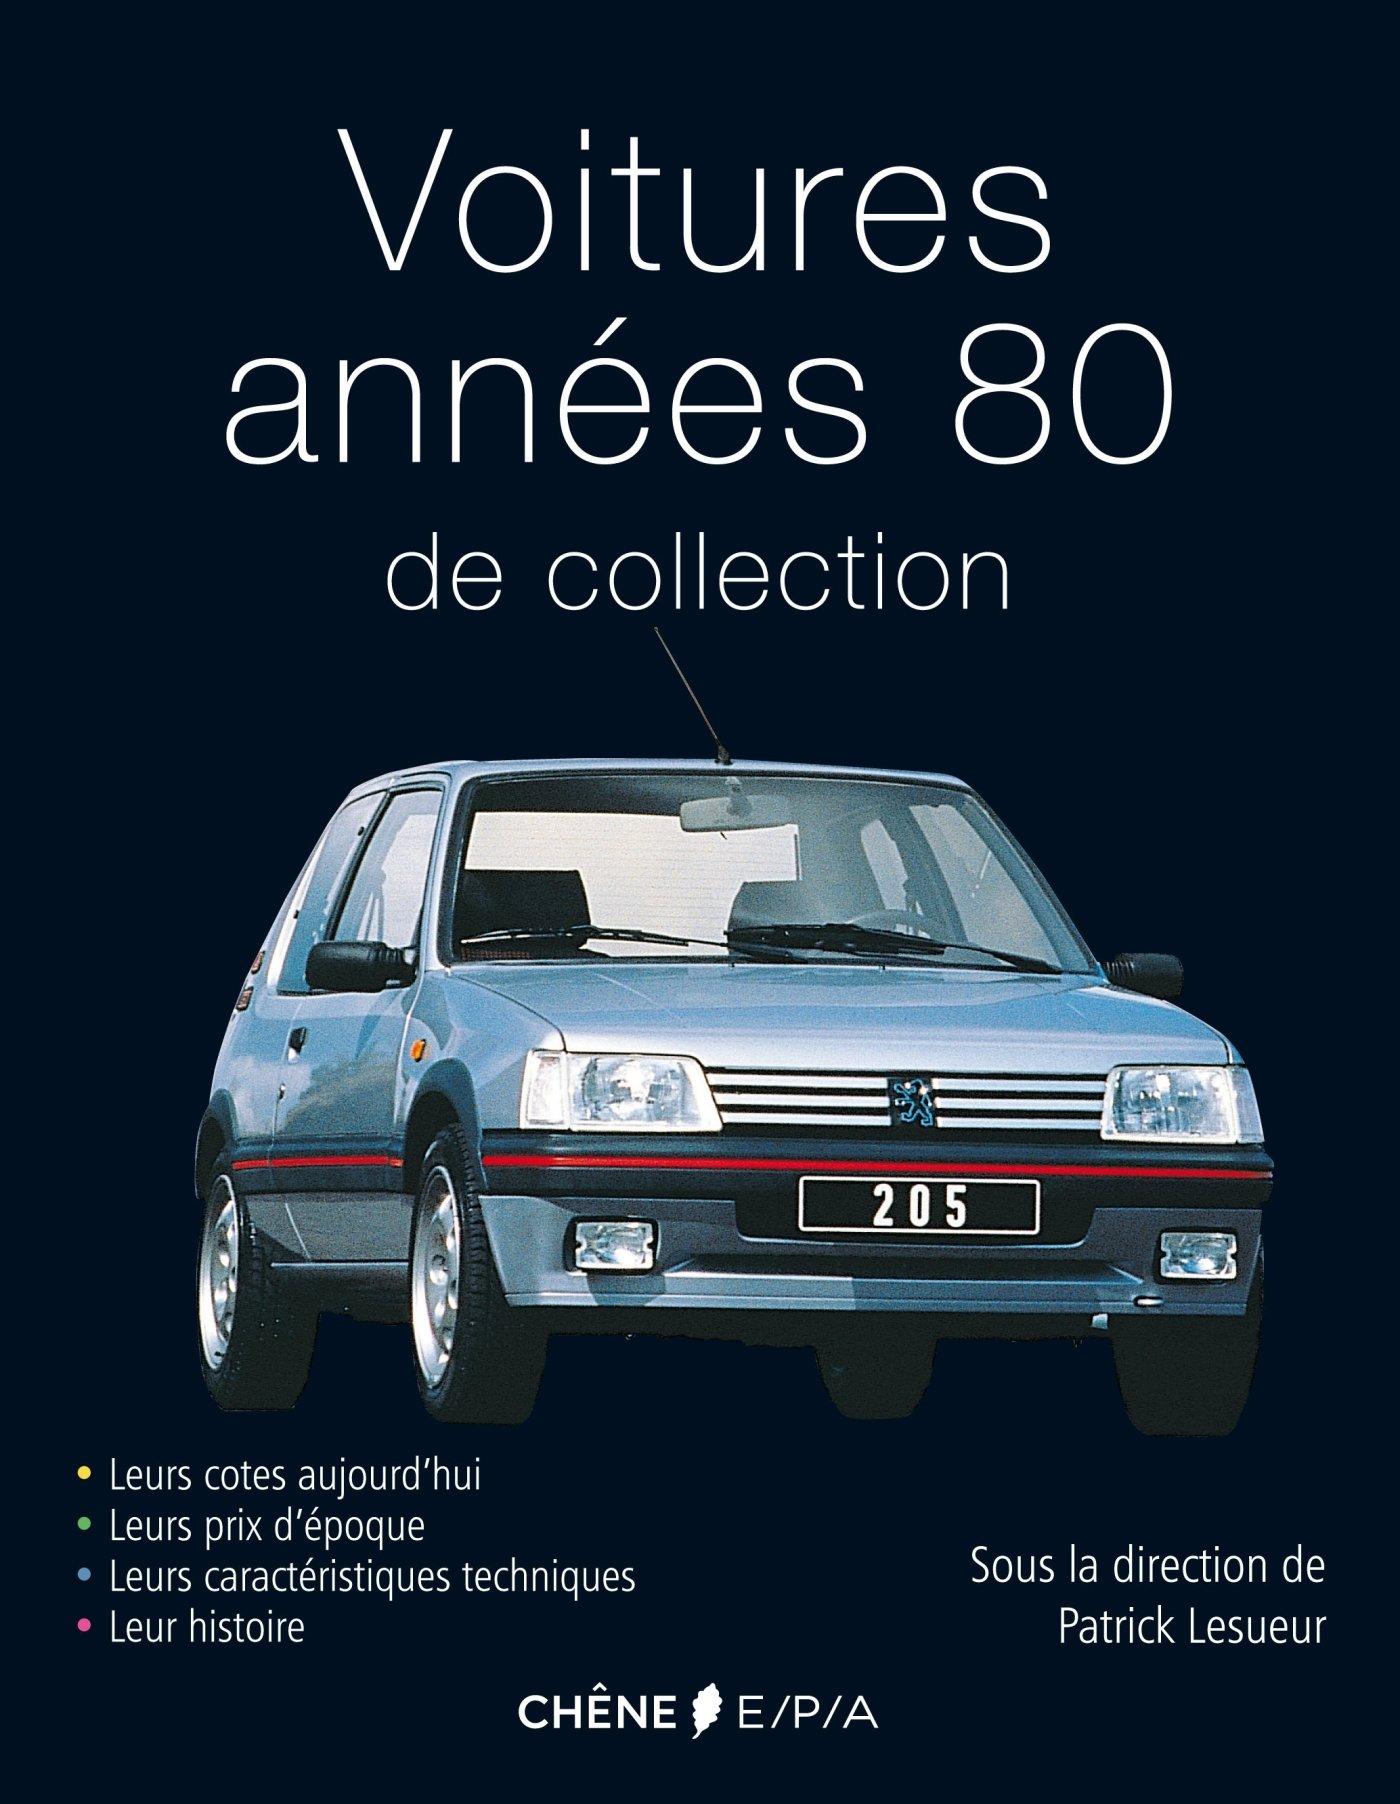 Voitures de collection années 80: Amazon.es: Patrick Lesueur: Libros en idiomas extranjeros